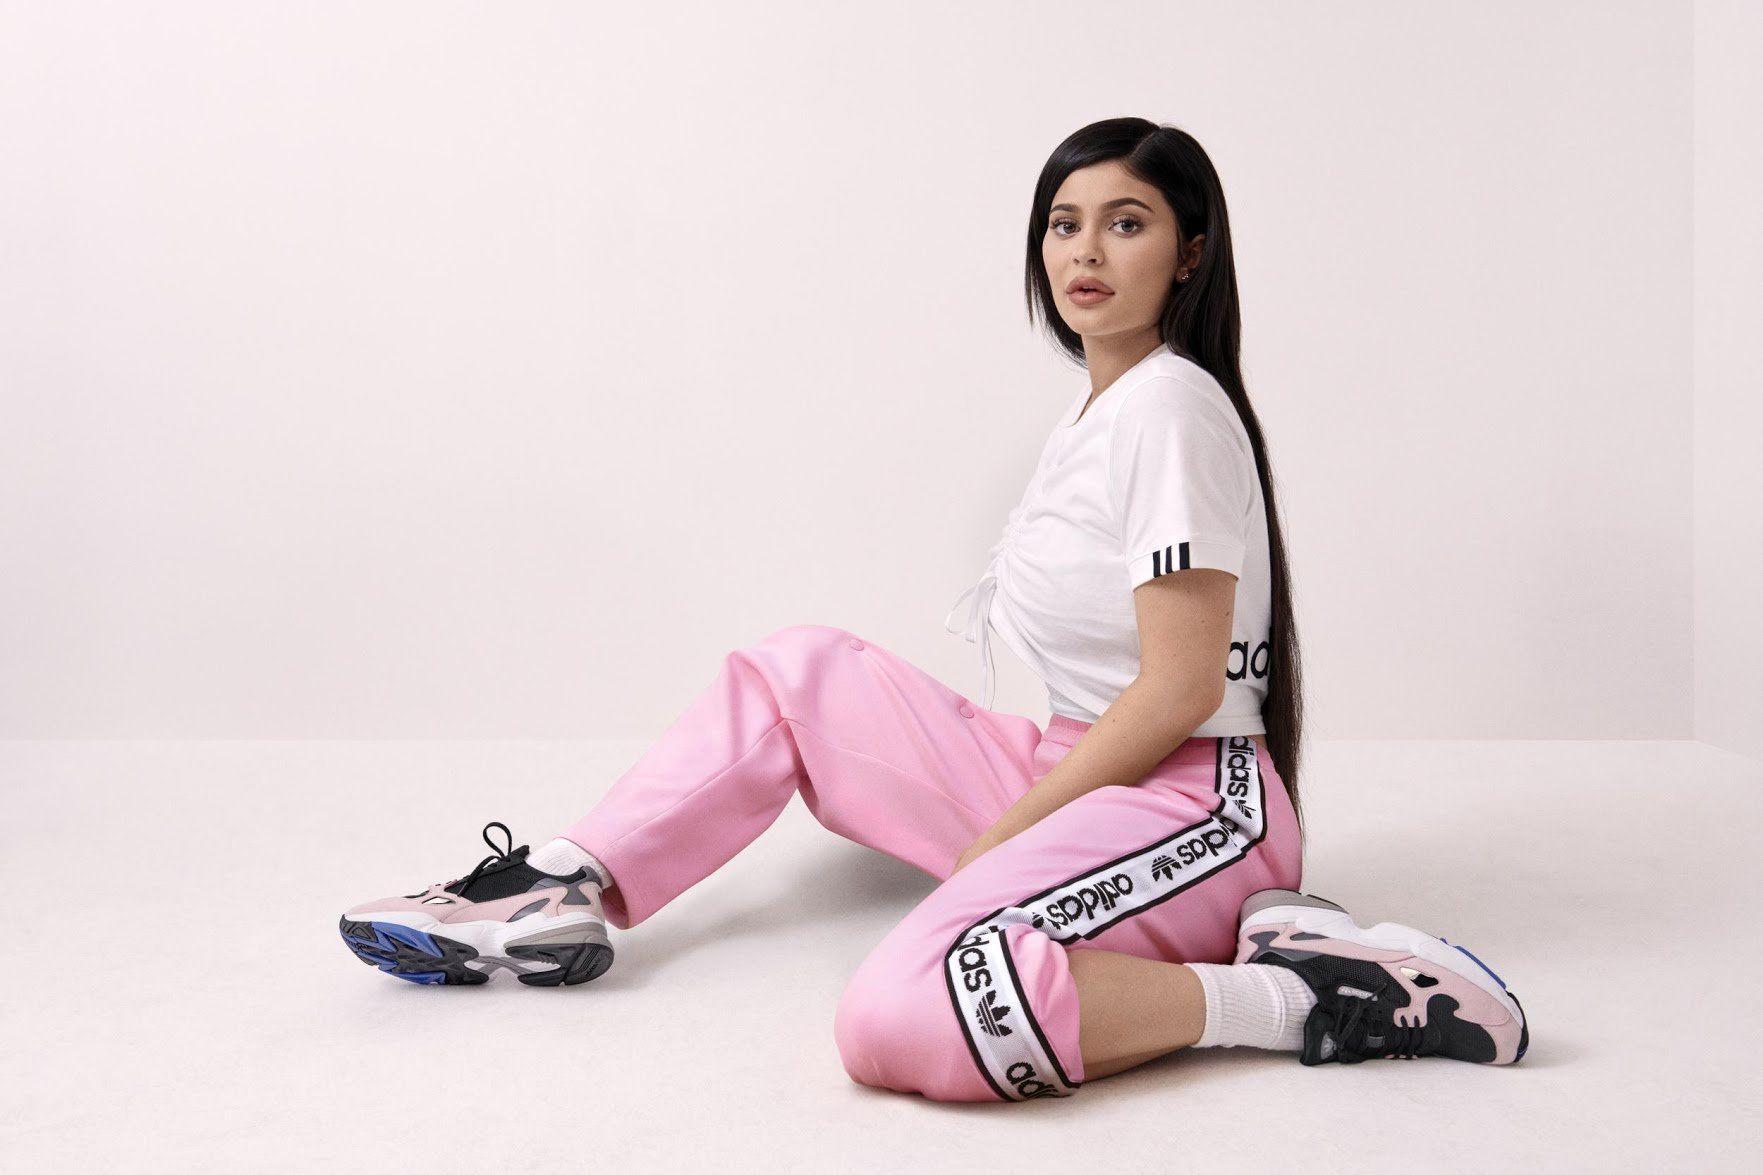 gillianvidegar Kylie jenner adidas, Kylie jenner shoes